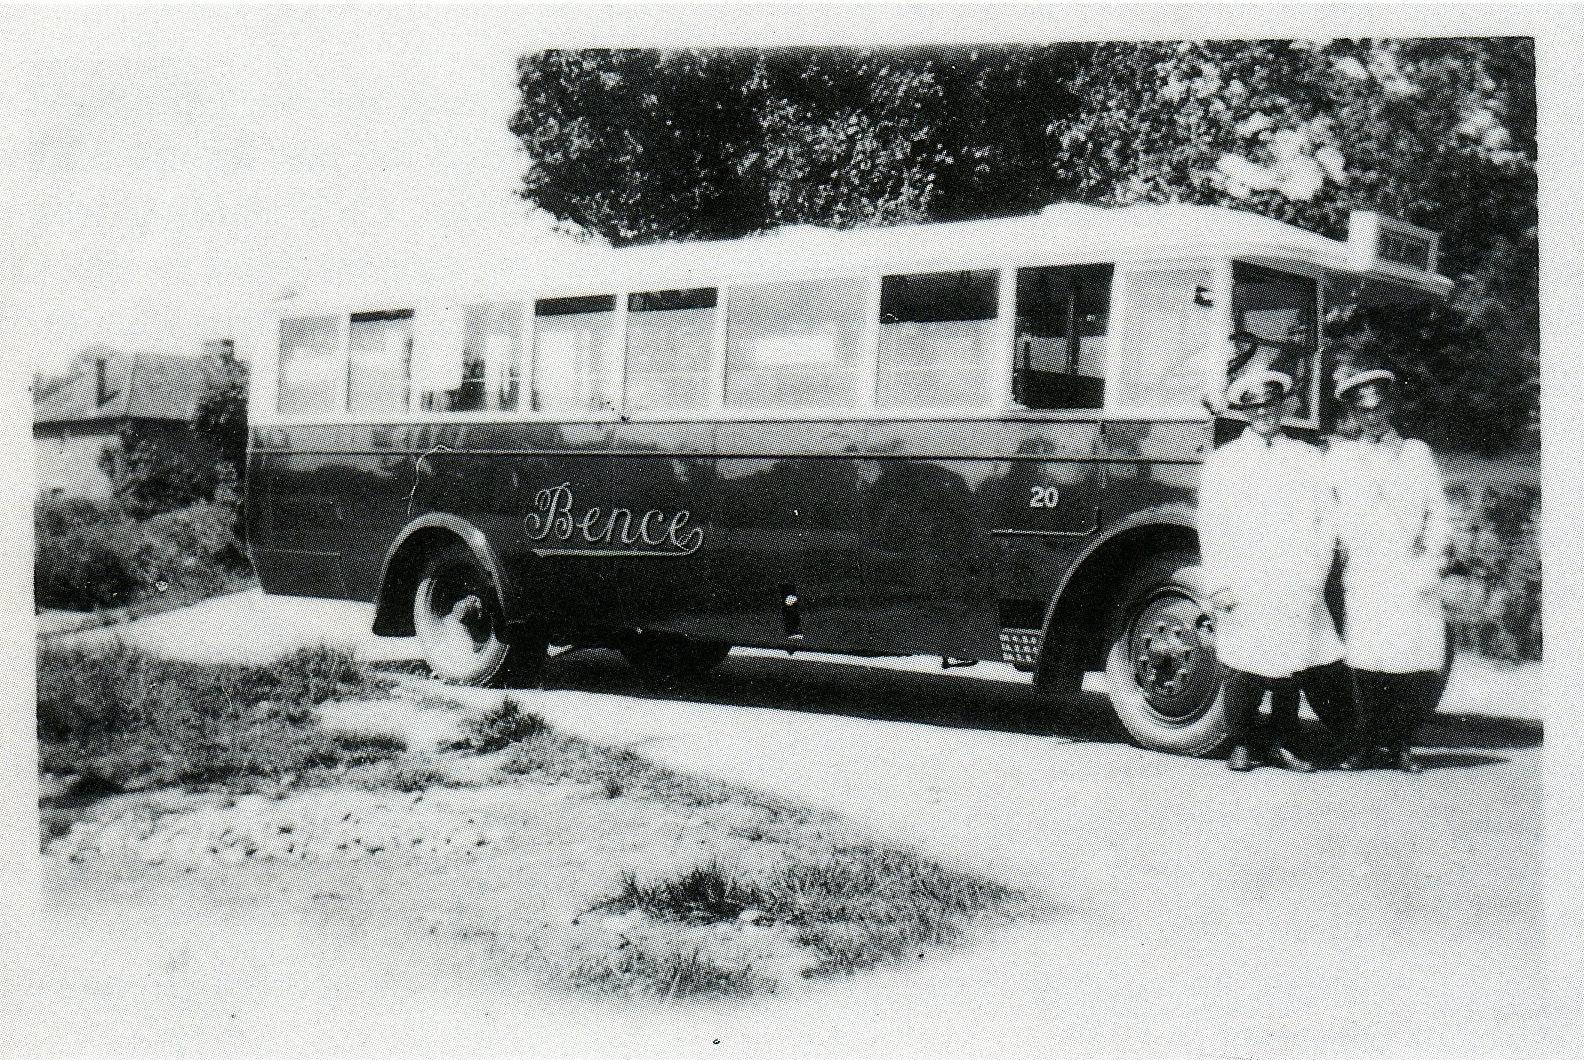 J Bence Longwell Green Coachworks Ltd Bristol England Uk